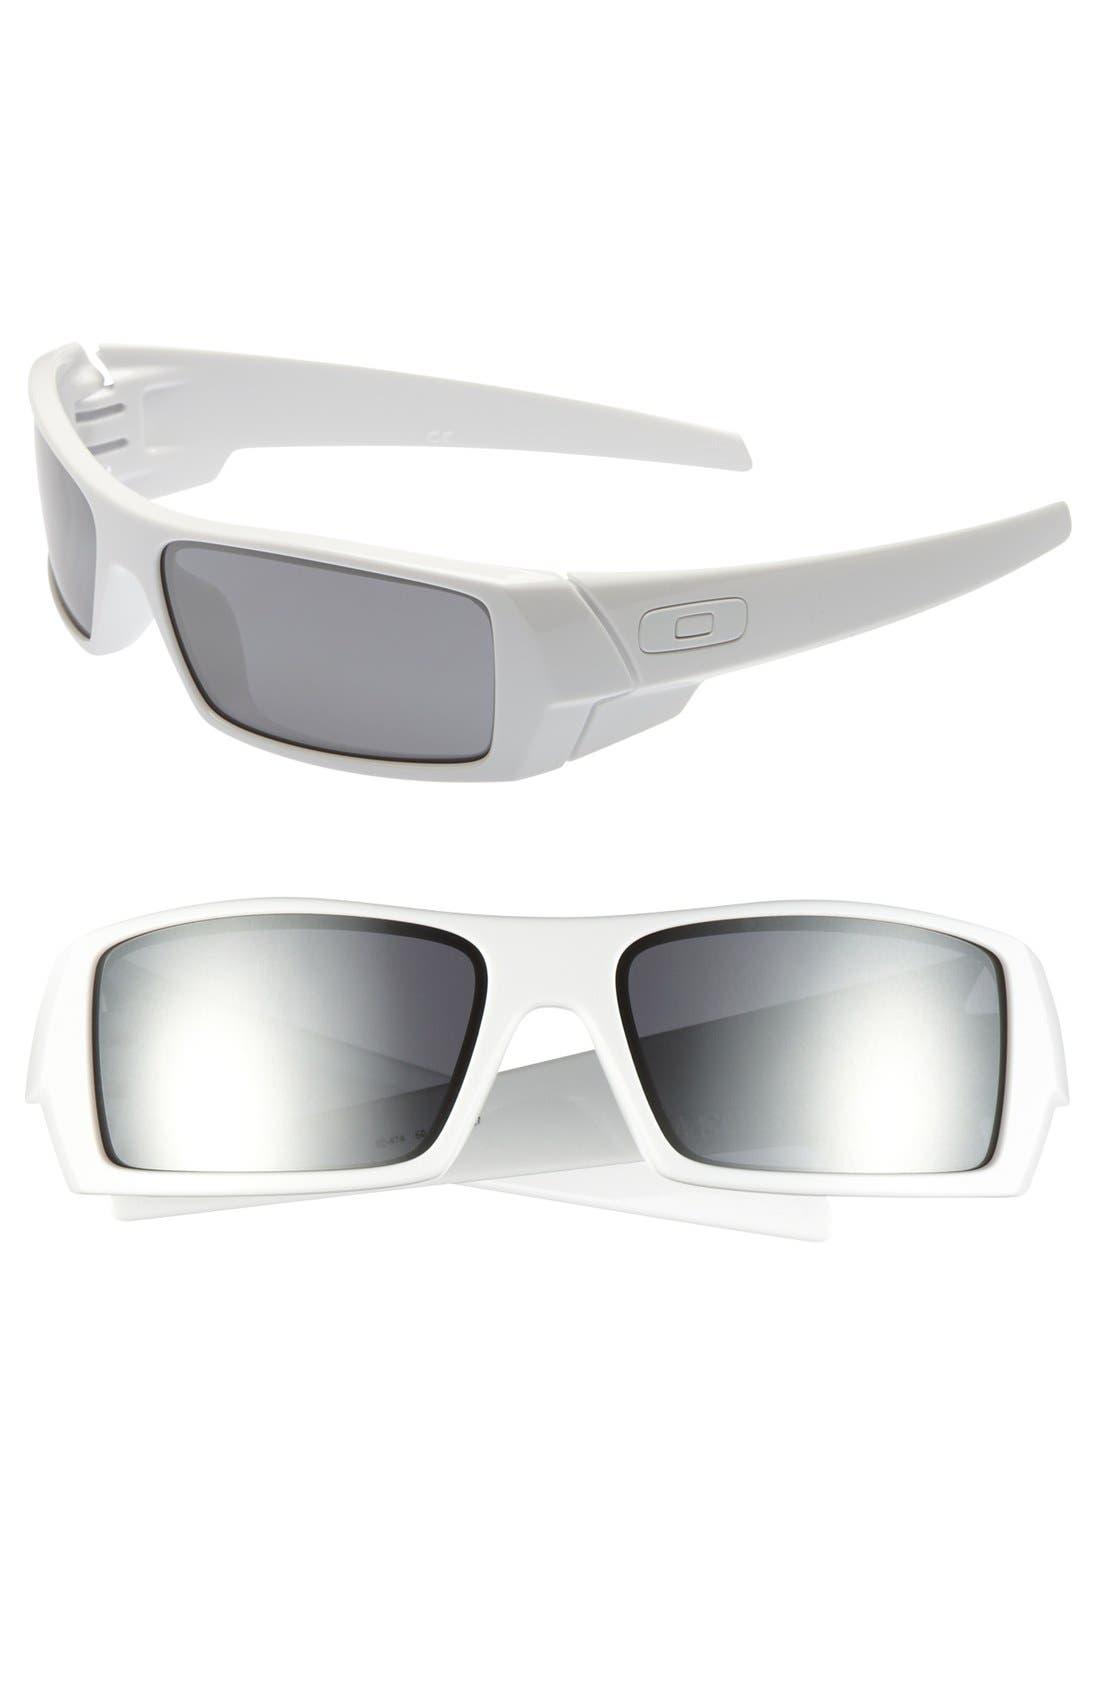 Alternate Image 1 Selected - Oakley 'Gascan' 60mm Sunglasses